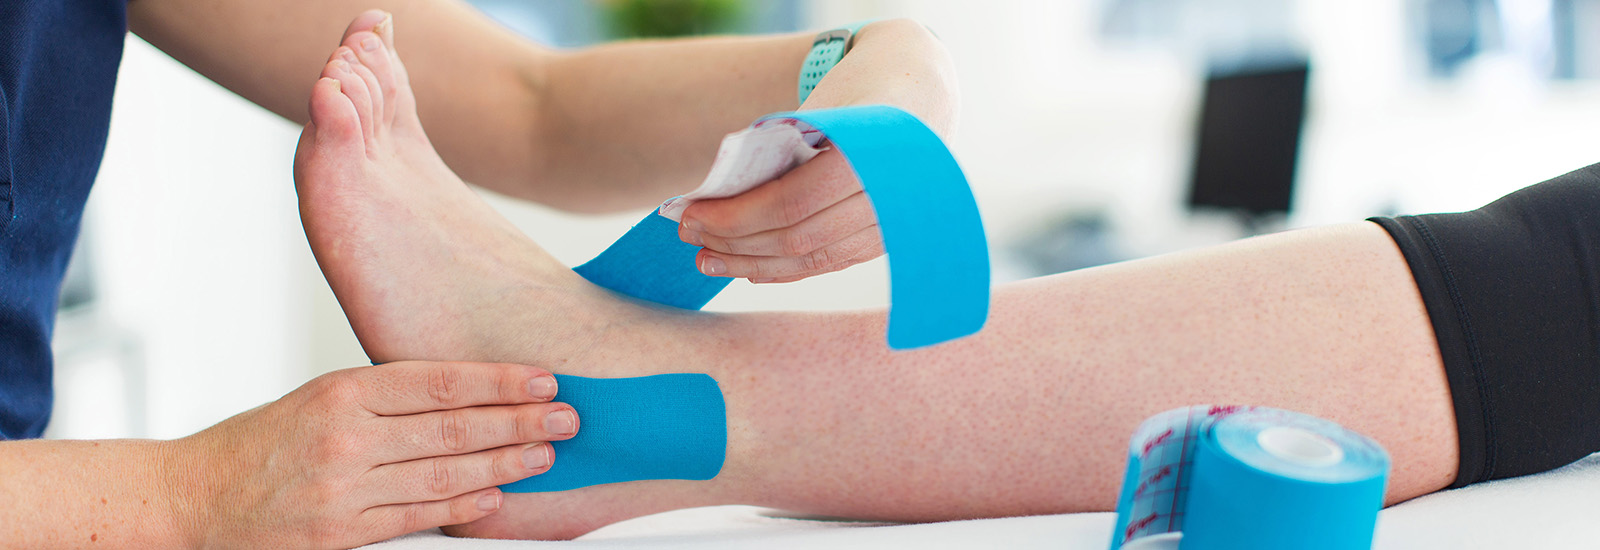 Fysiotherapie Doetinchem